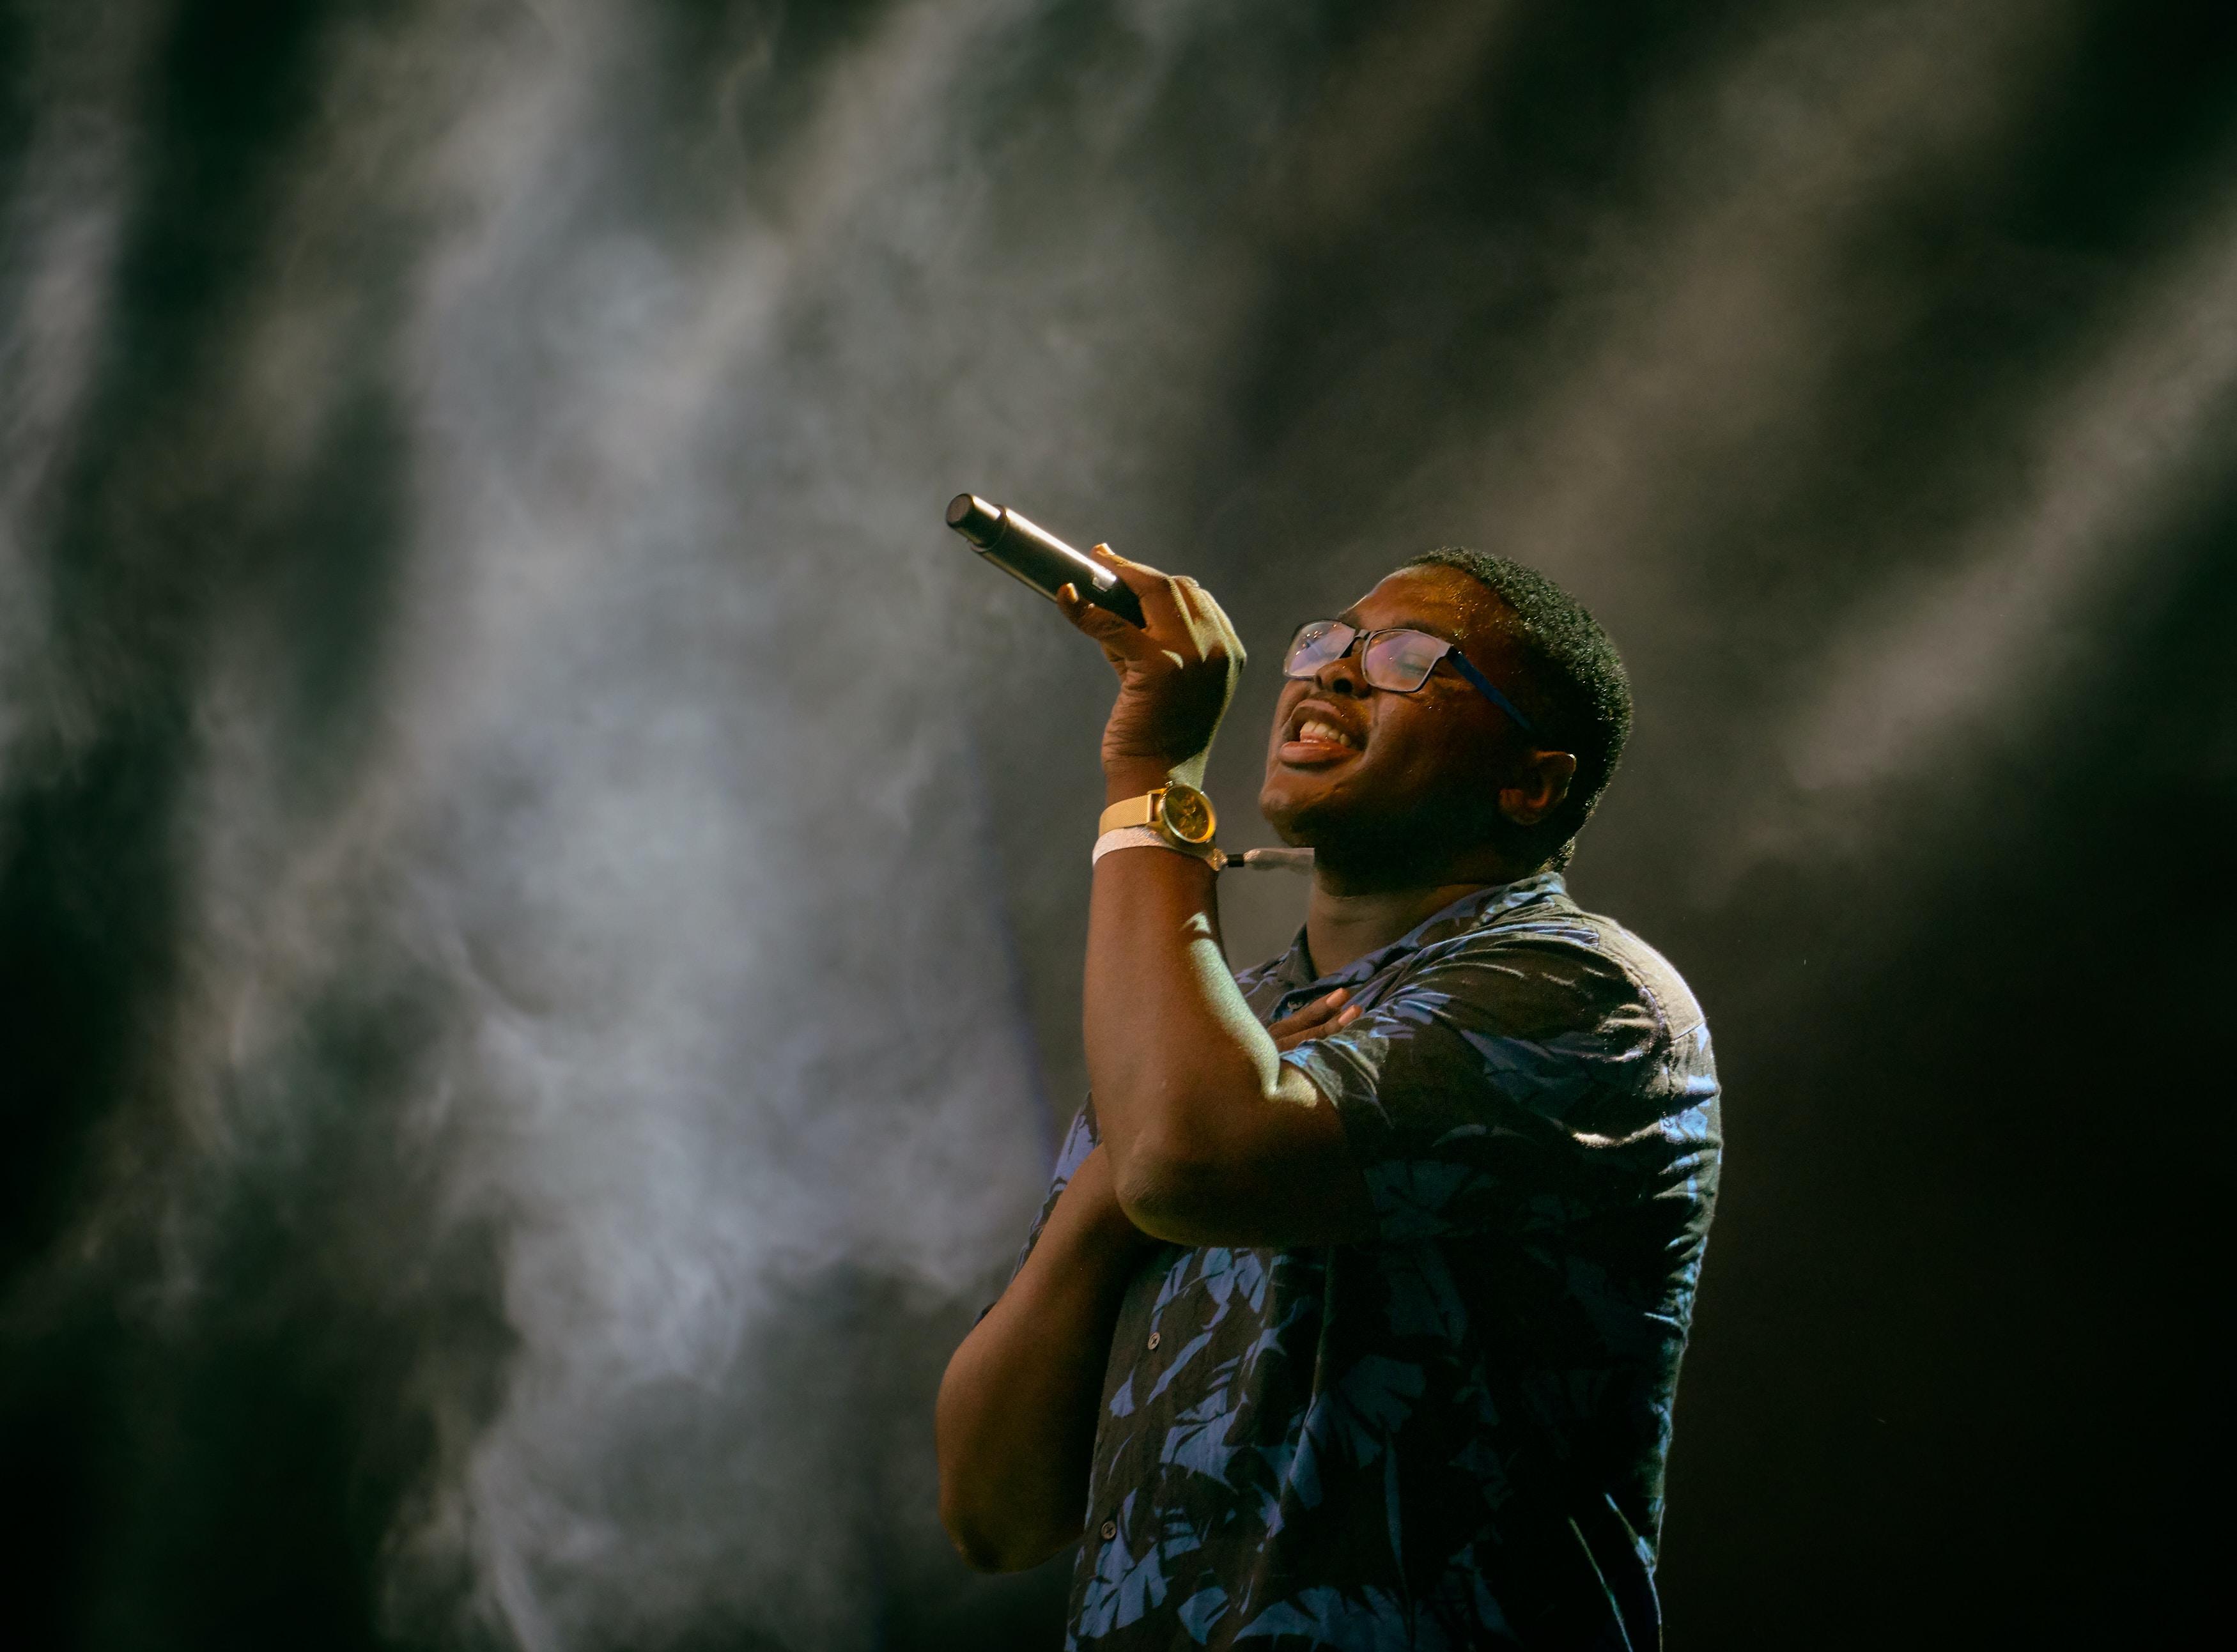 man holding microphone singing